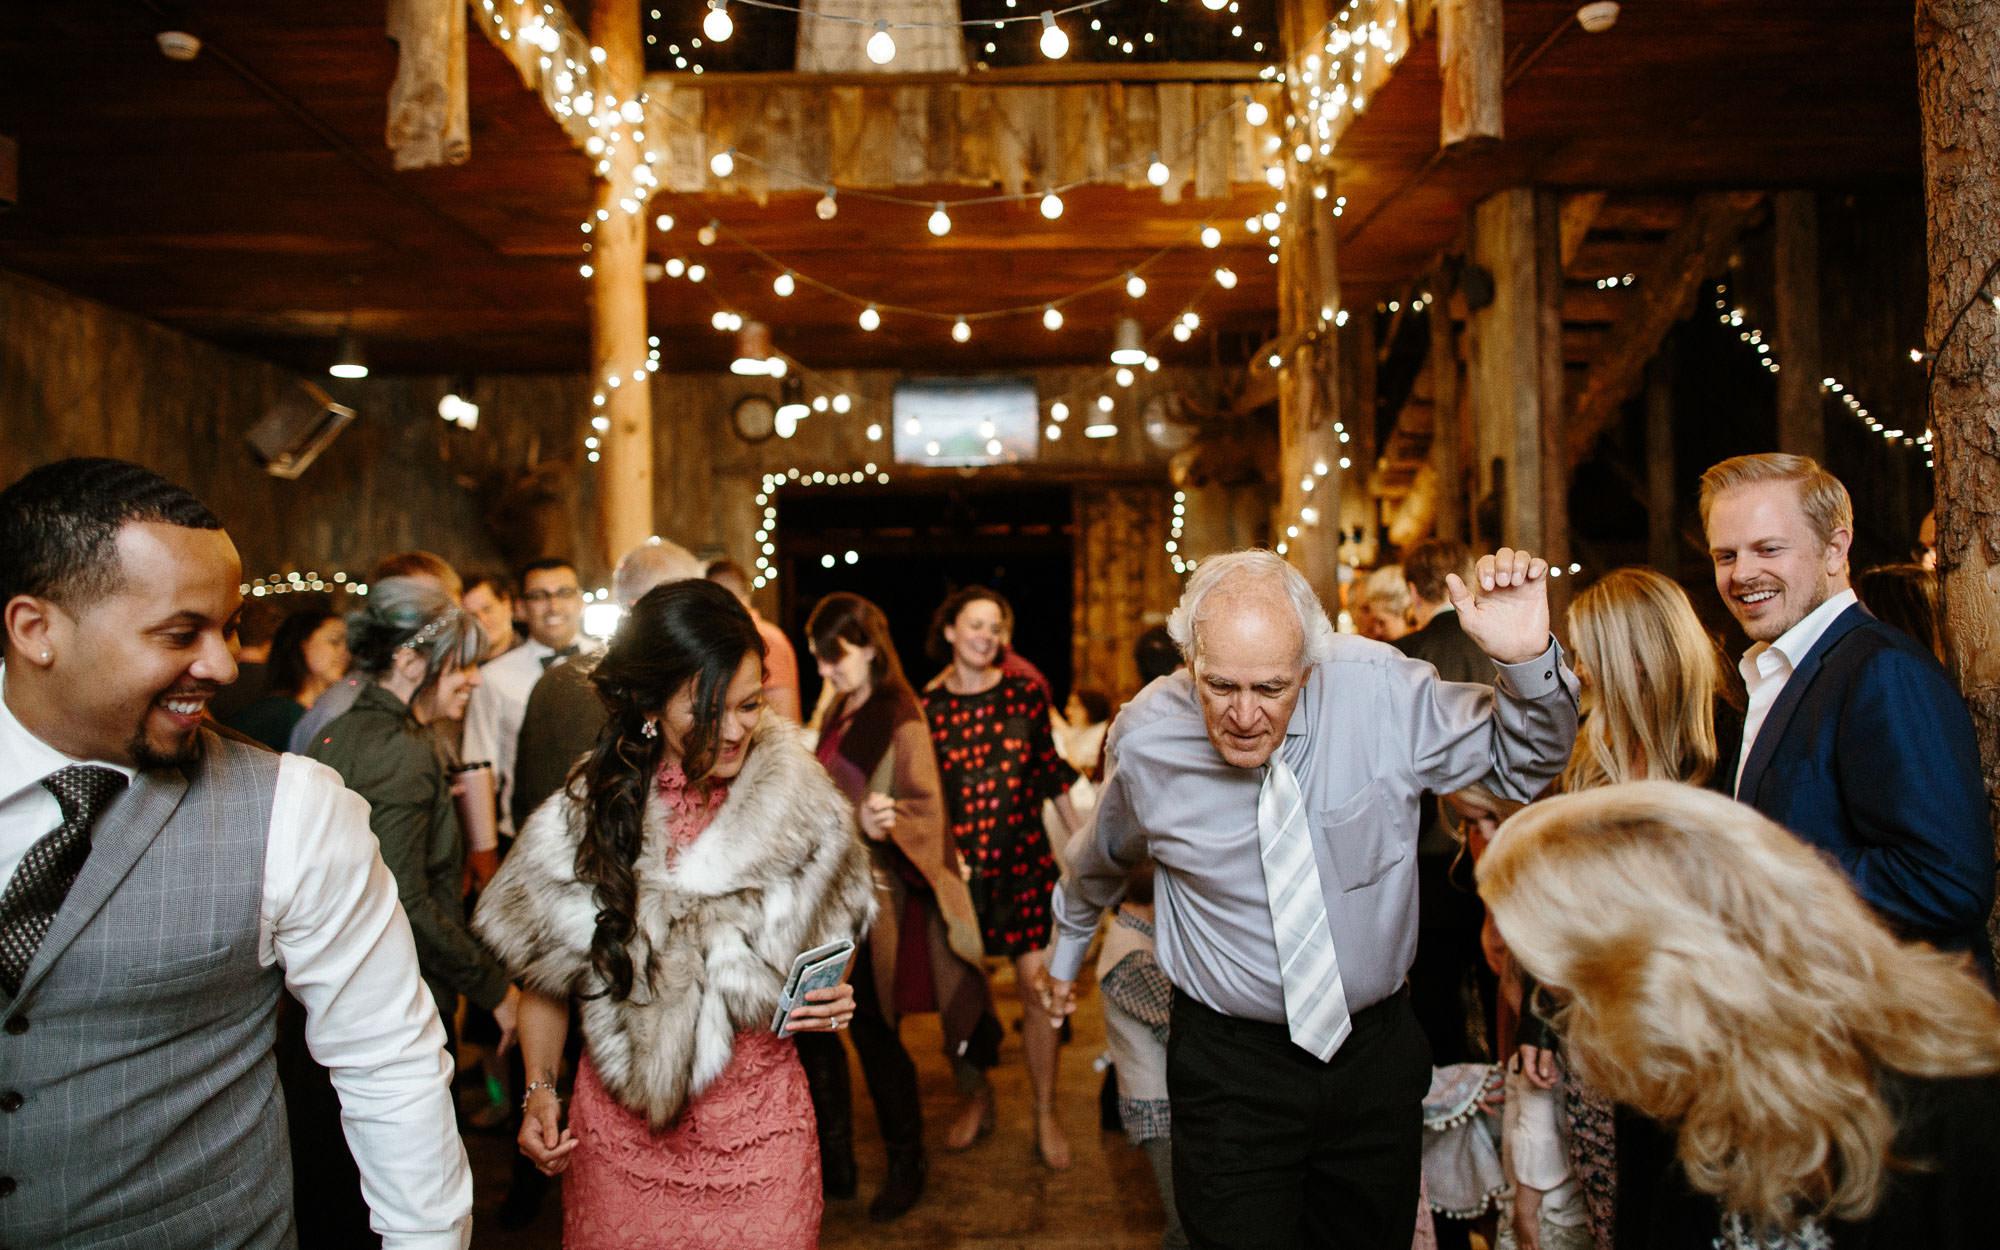 bucci-barn-wedding-elopement-evergreen-boulder-denver-colorado-adventerous-romantic-timeless-110.jpg